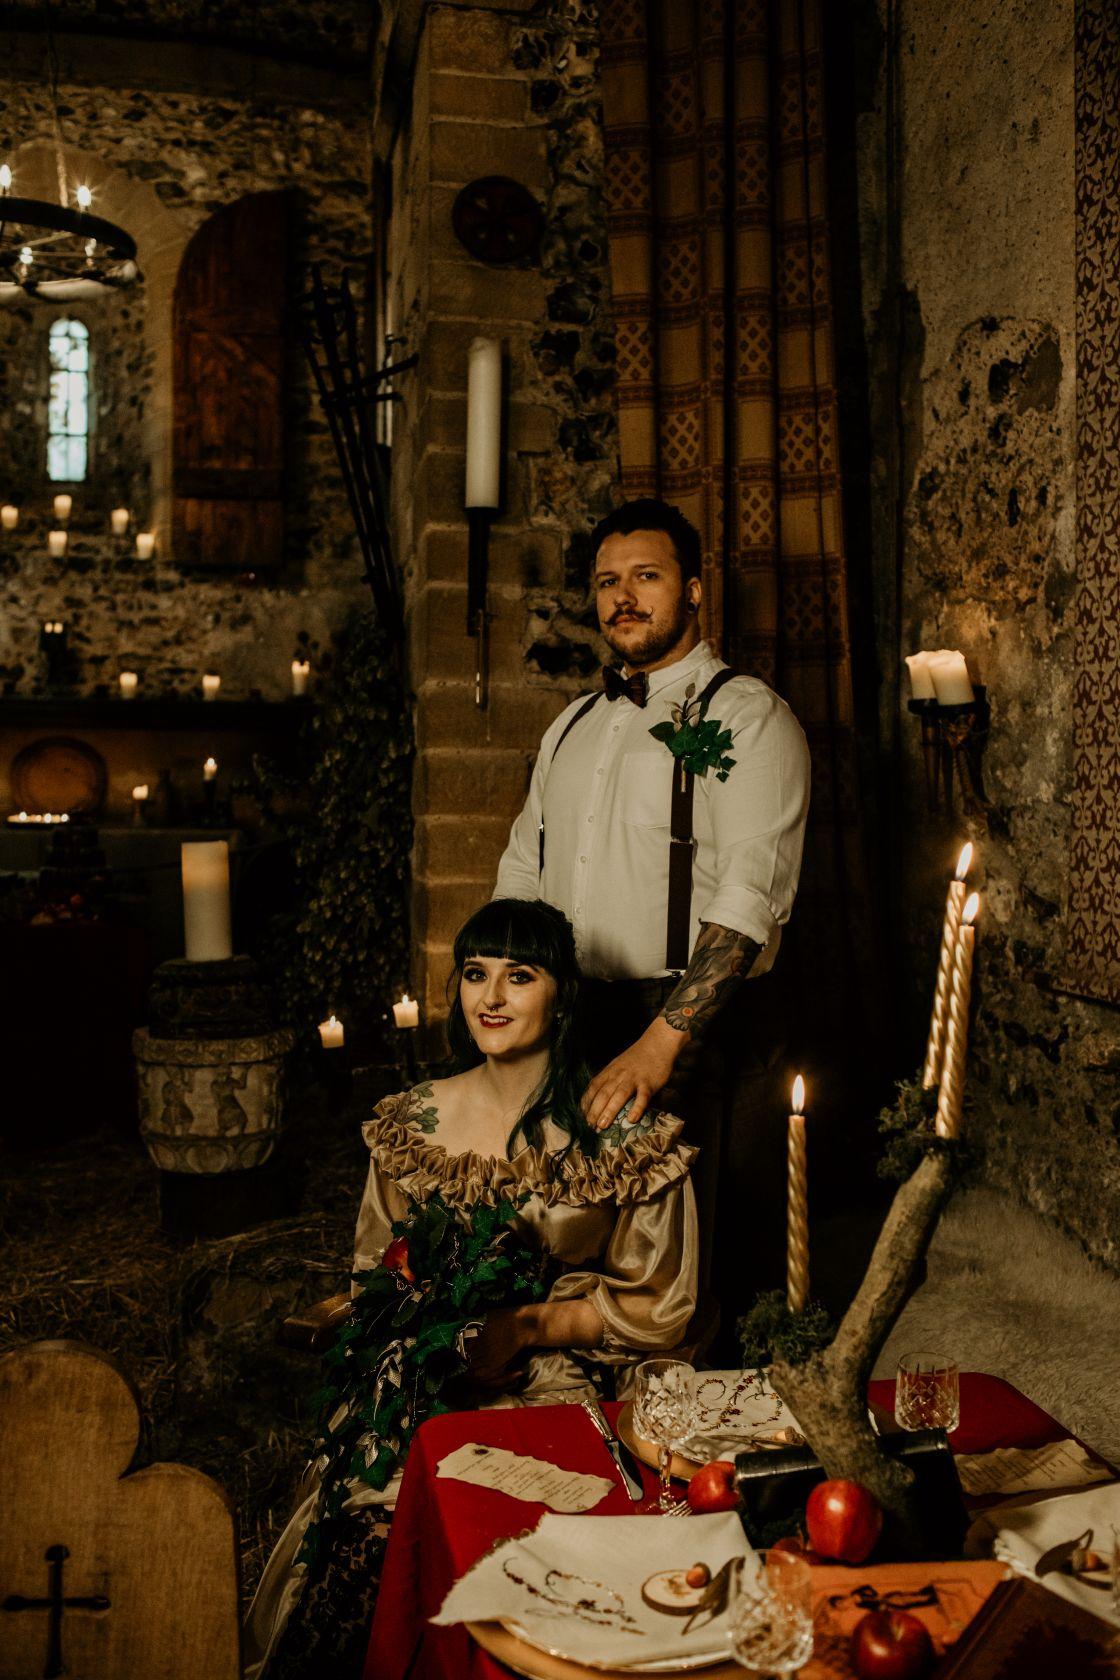 alternative fairytale wedding- snow white wedding- charlotte laurie designs-chloe mary photo- unconventional wedding- alternative wedding inspiration- dark fairytale wedding